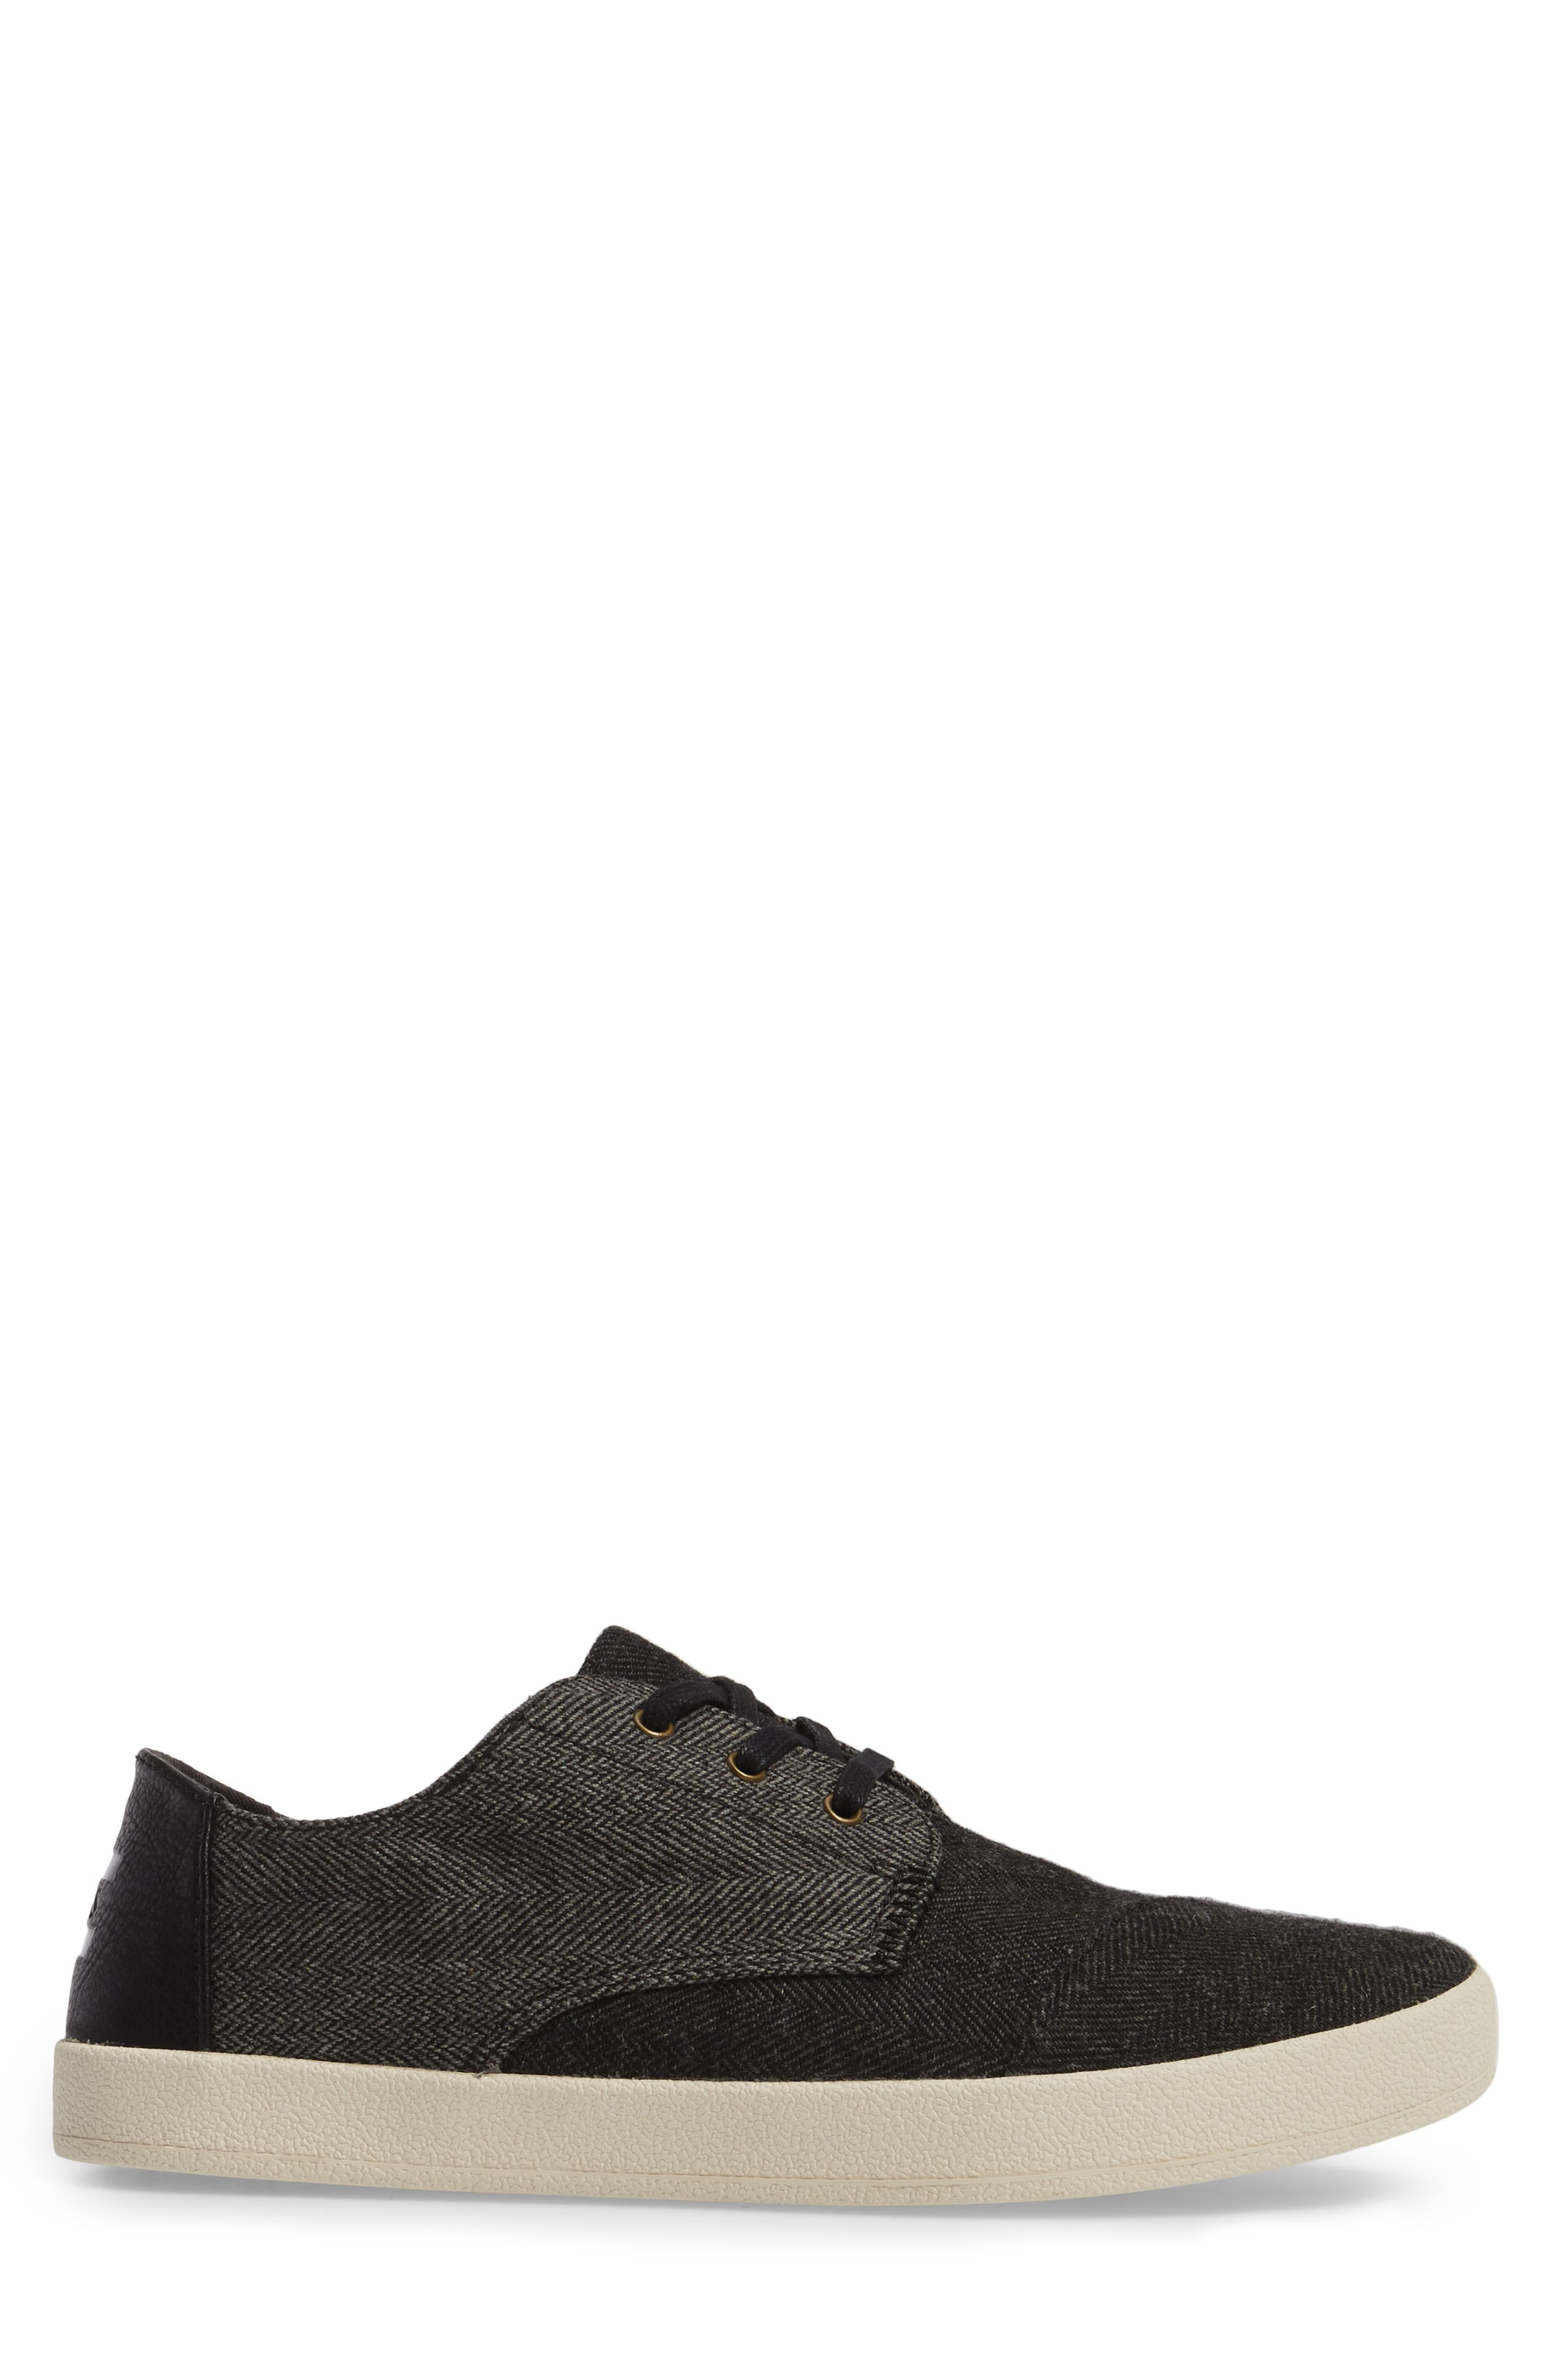 'Paseo' Sneaker,                             Alternate thumbnail 3, color,                             Black/ Grey